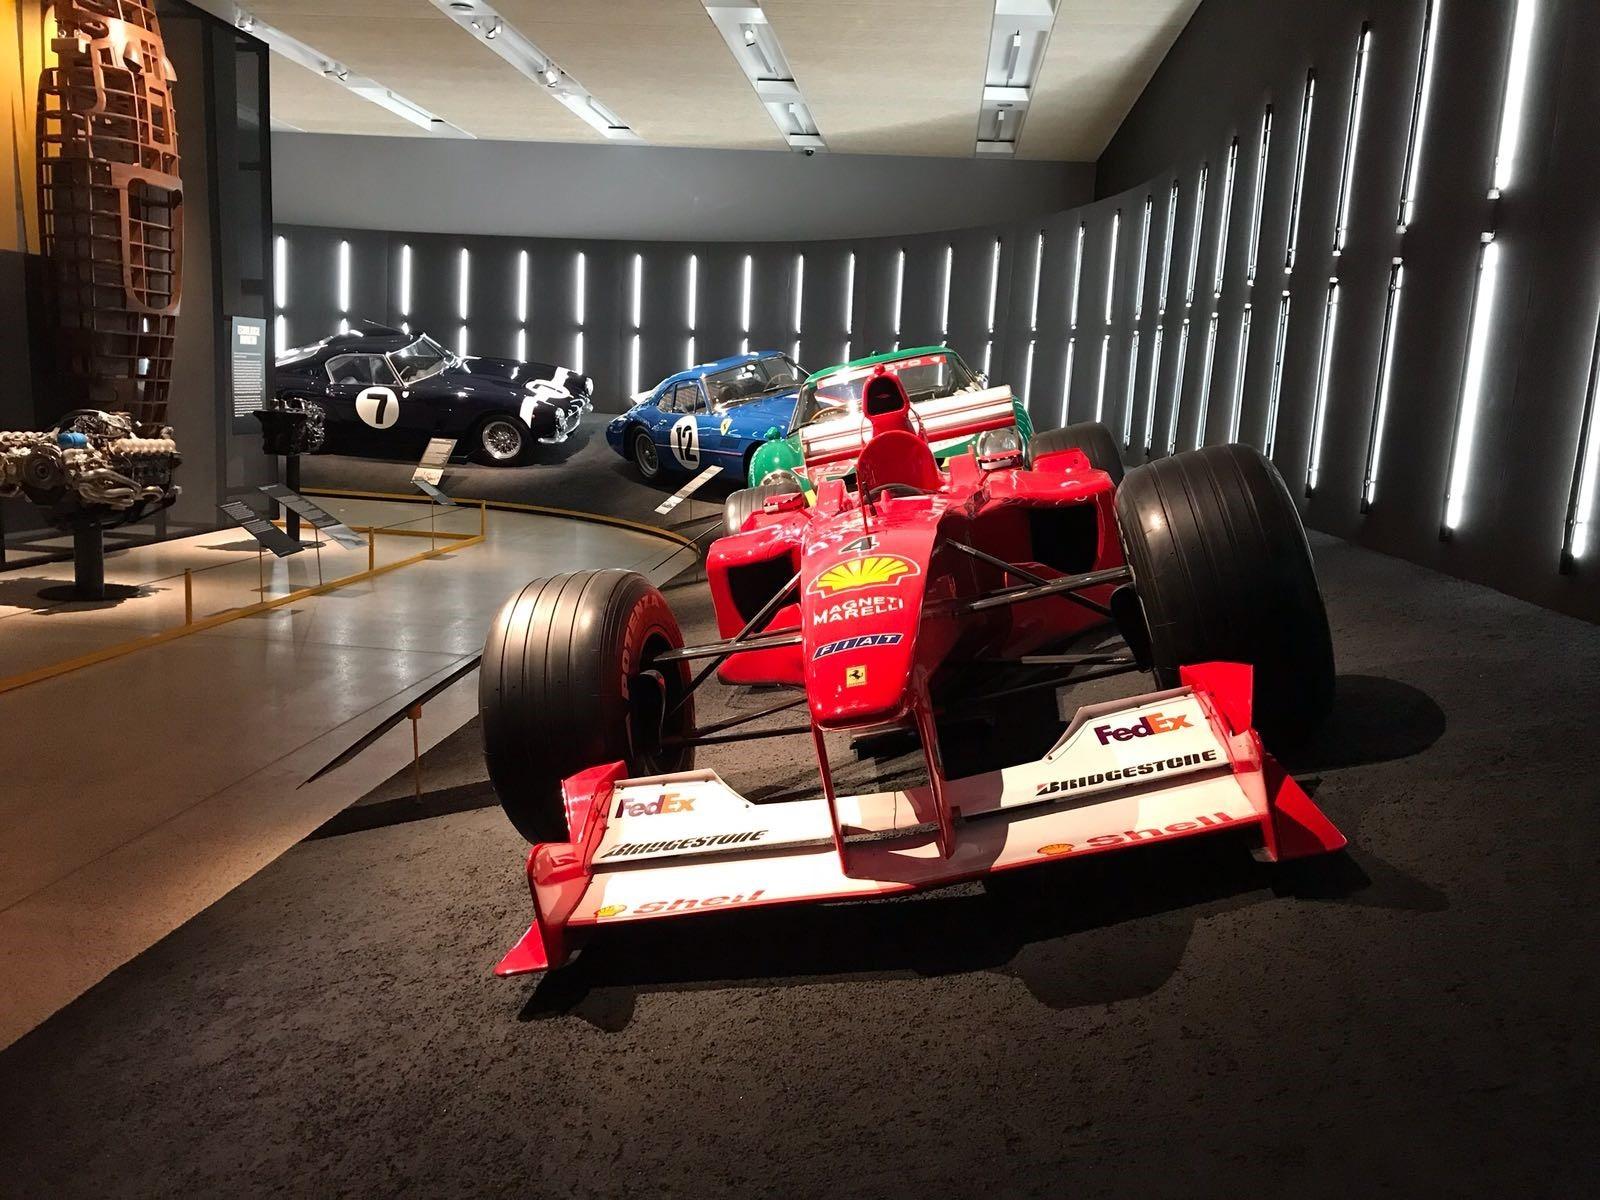 Ferrari-exhib-line-up.jpg#asset:2594